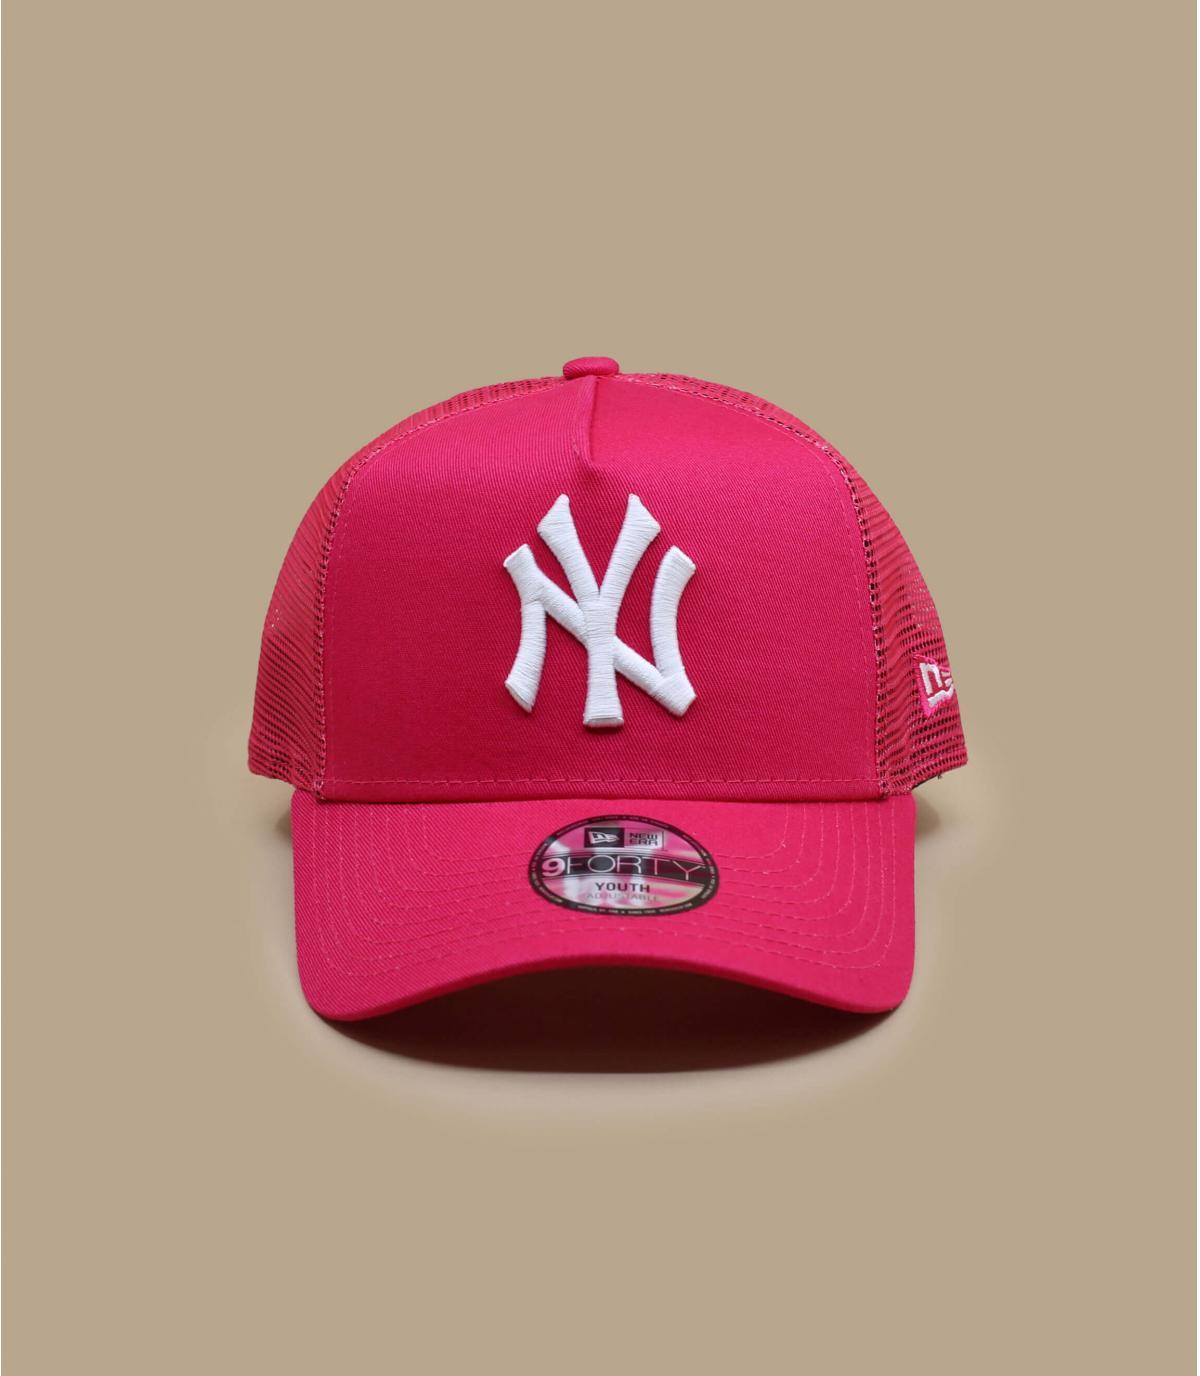 Detalles Trucker Kids Tonal Mesh NY pink imagen 2